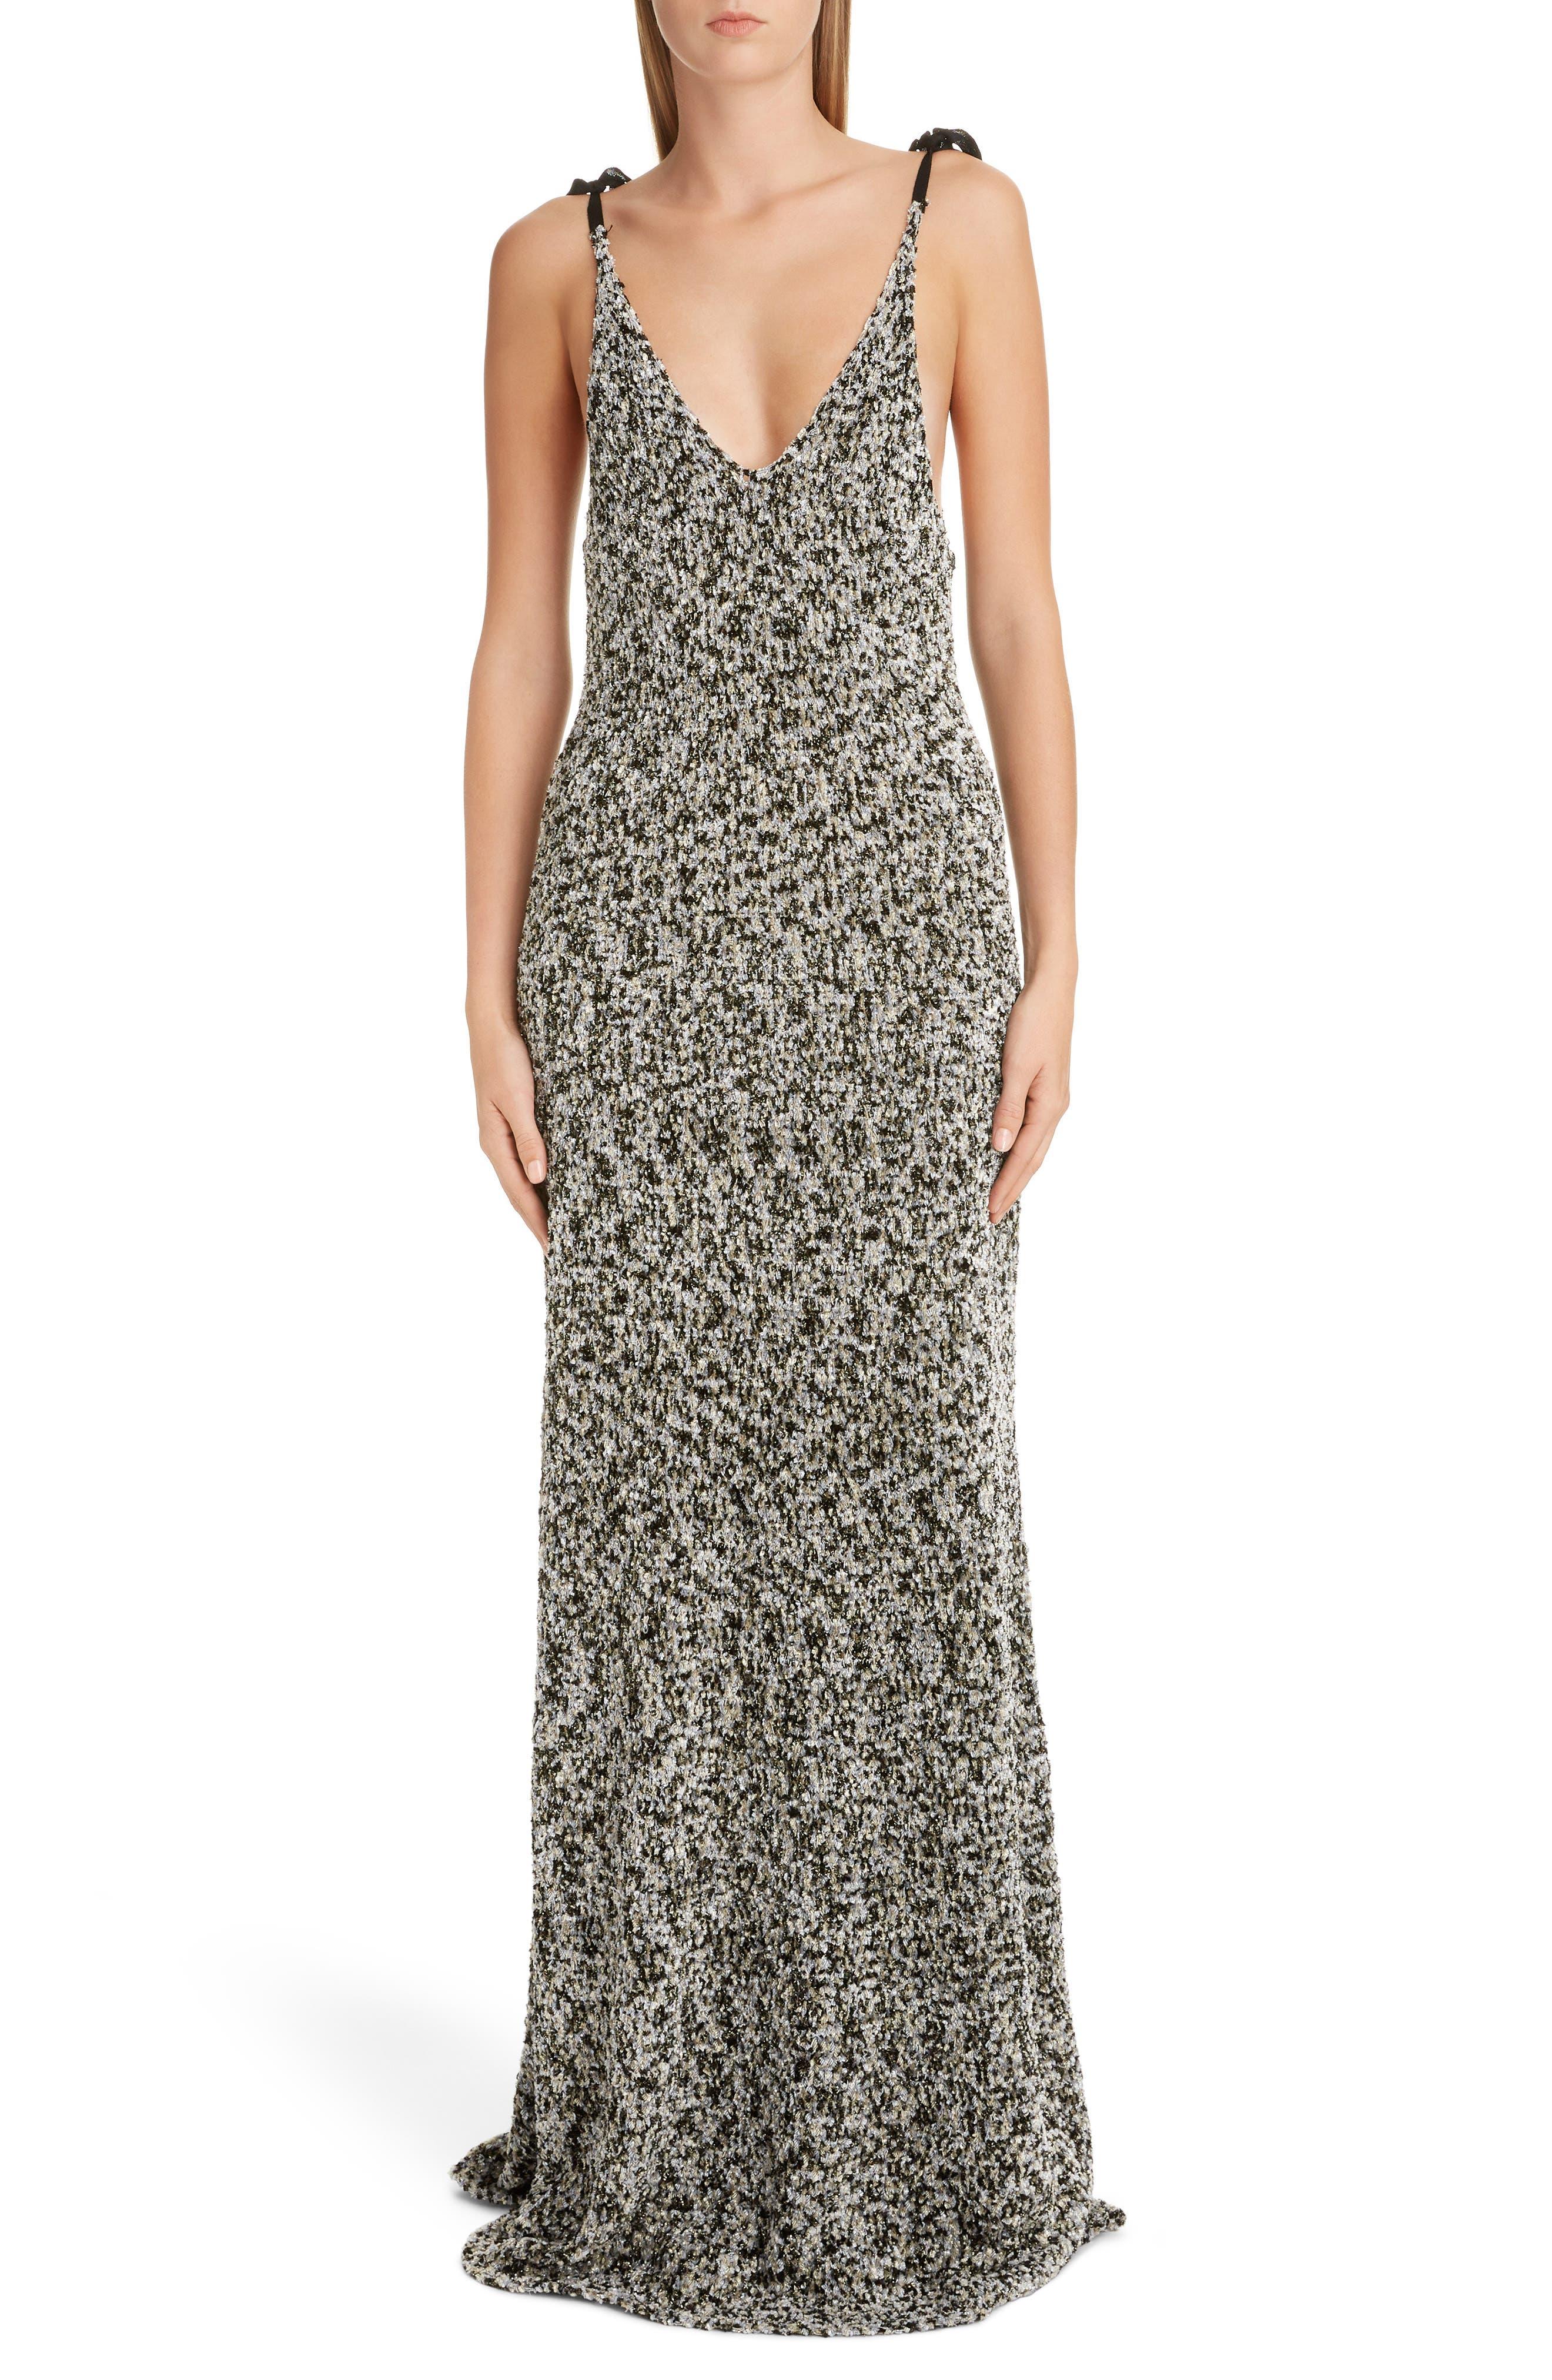 Loewe Dresses Metallic Knit Maxi Dress